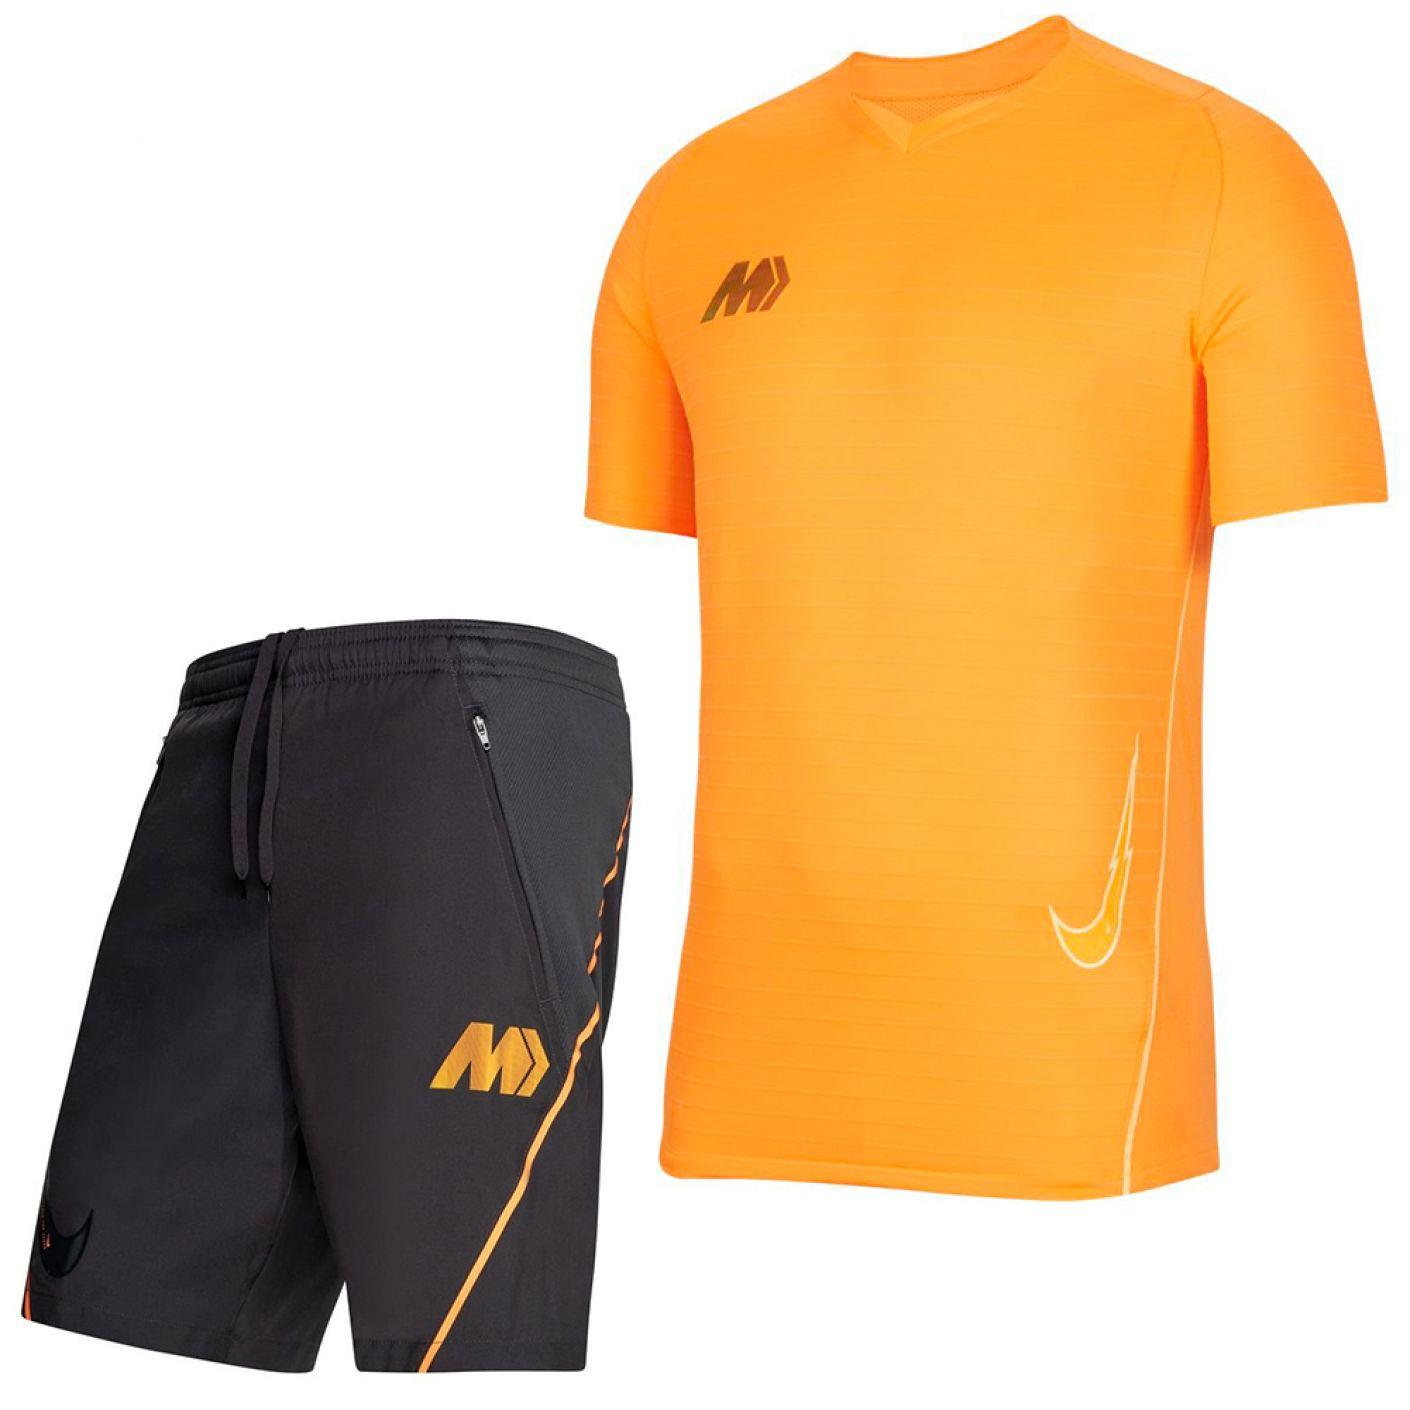 Nike Mercurial Strike Trainingsset Oranje